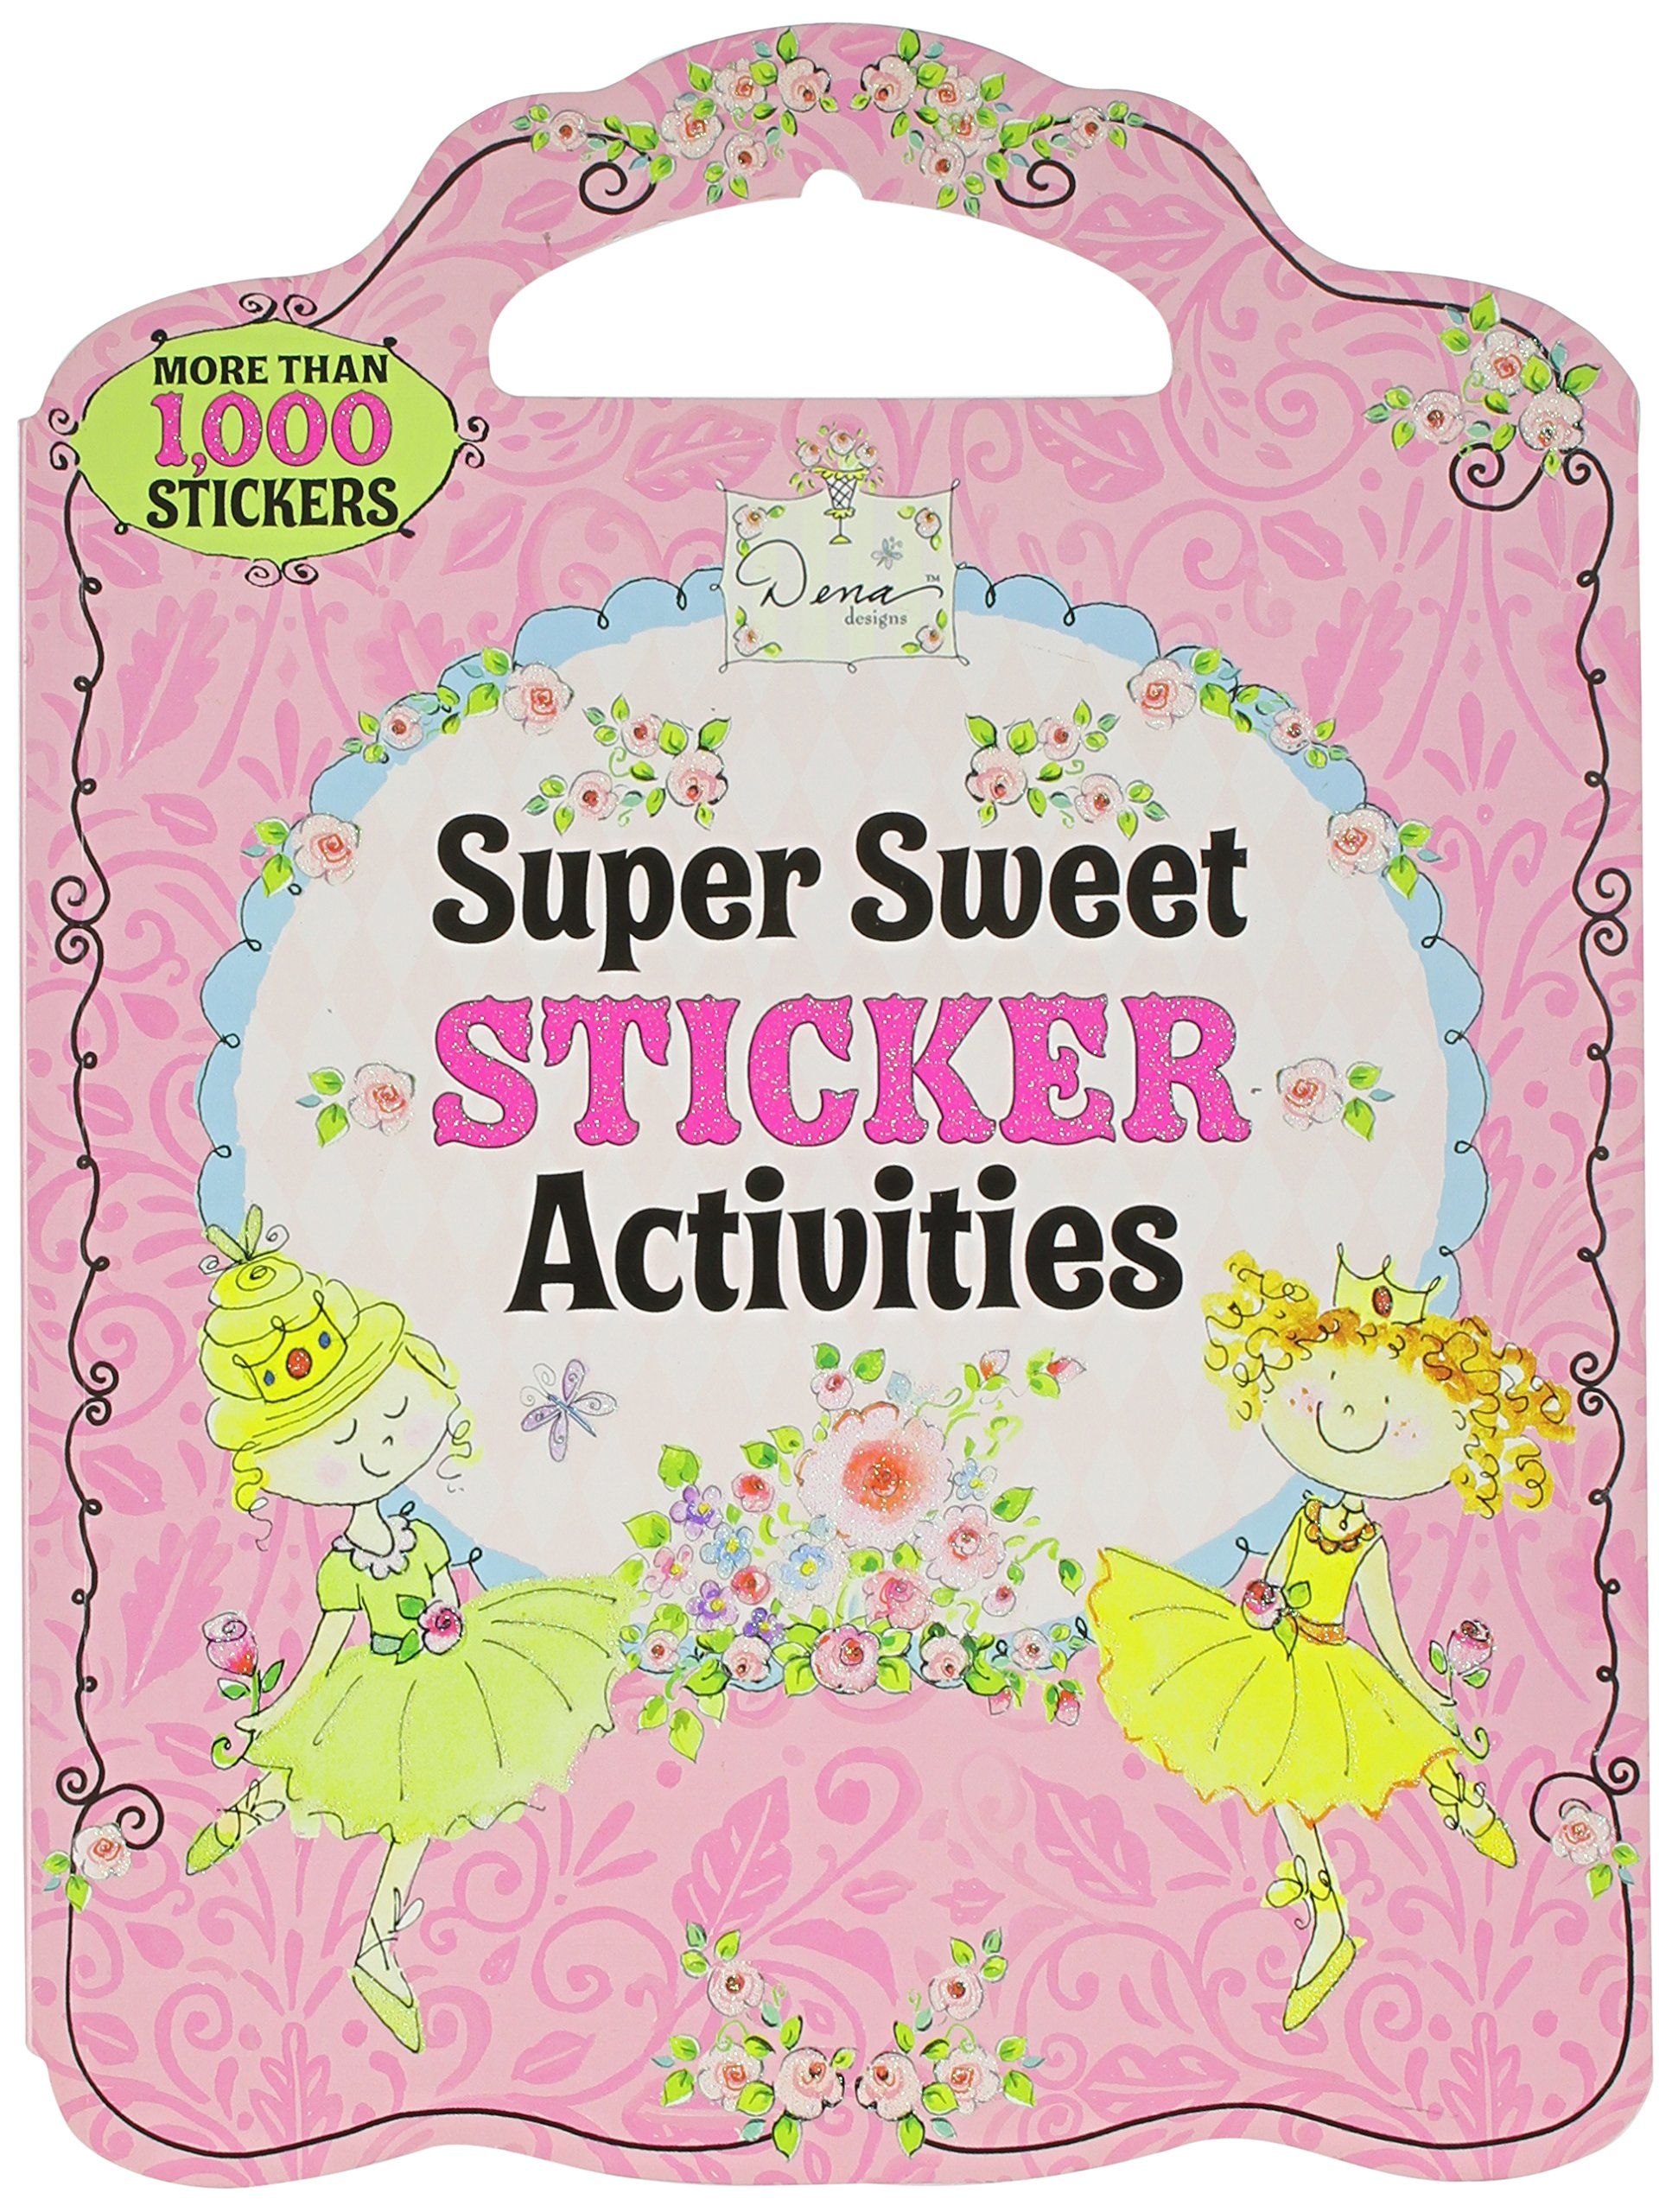 Super Sweet Sticker Activities PDF